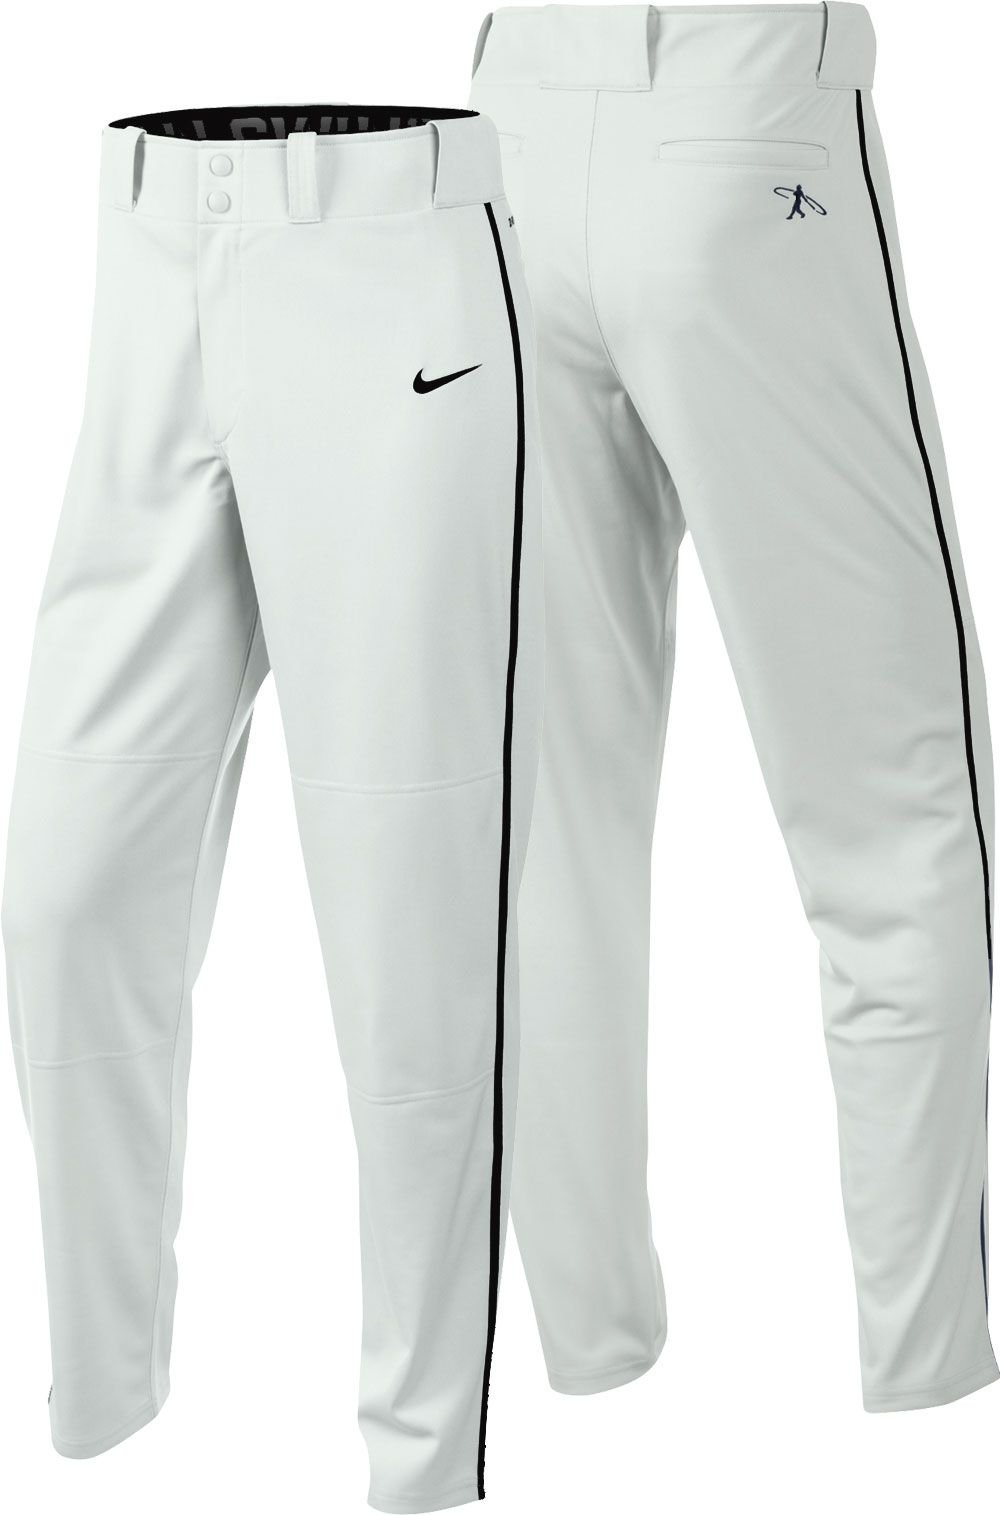 Nike Boys Swingman Dri-FIT Piped Baseball Pants (White/Black, Medium) by Nike (Image #1)